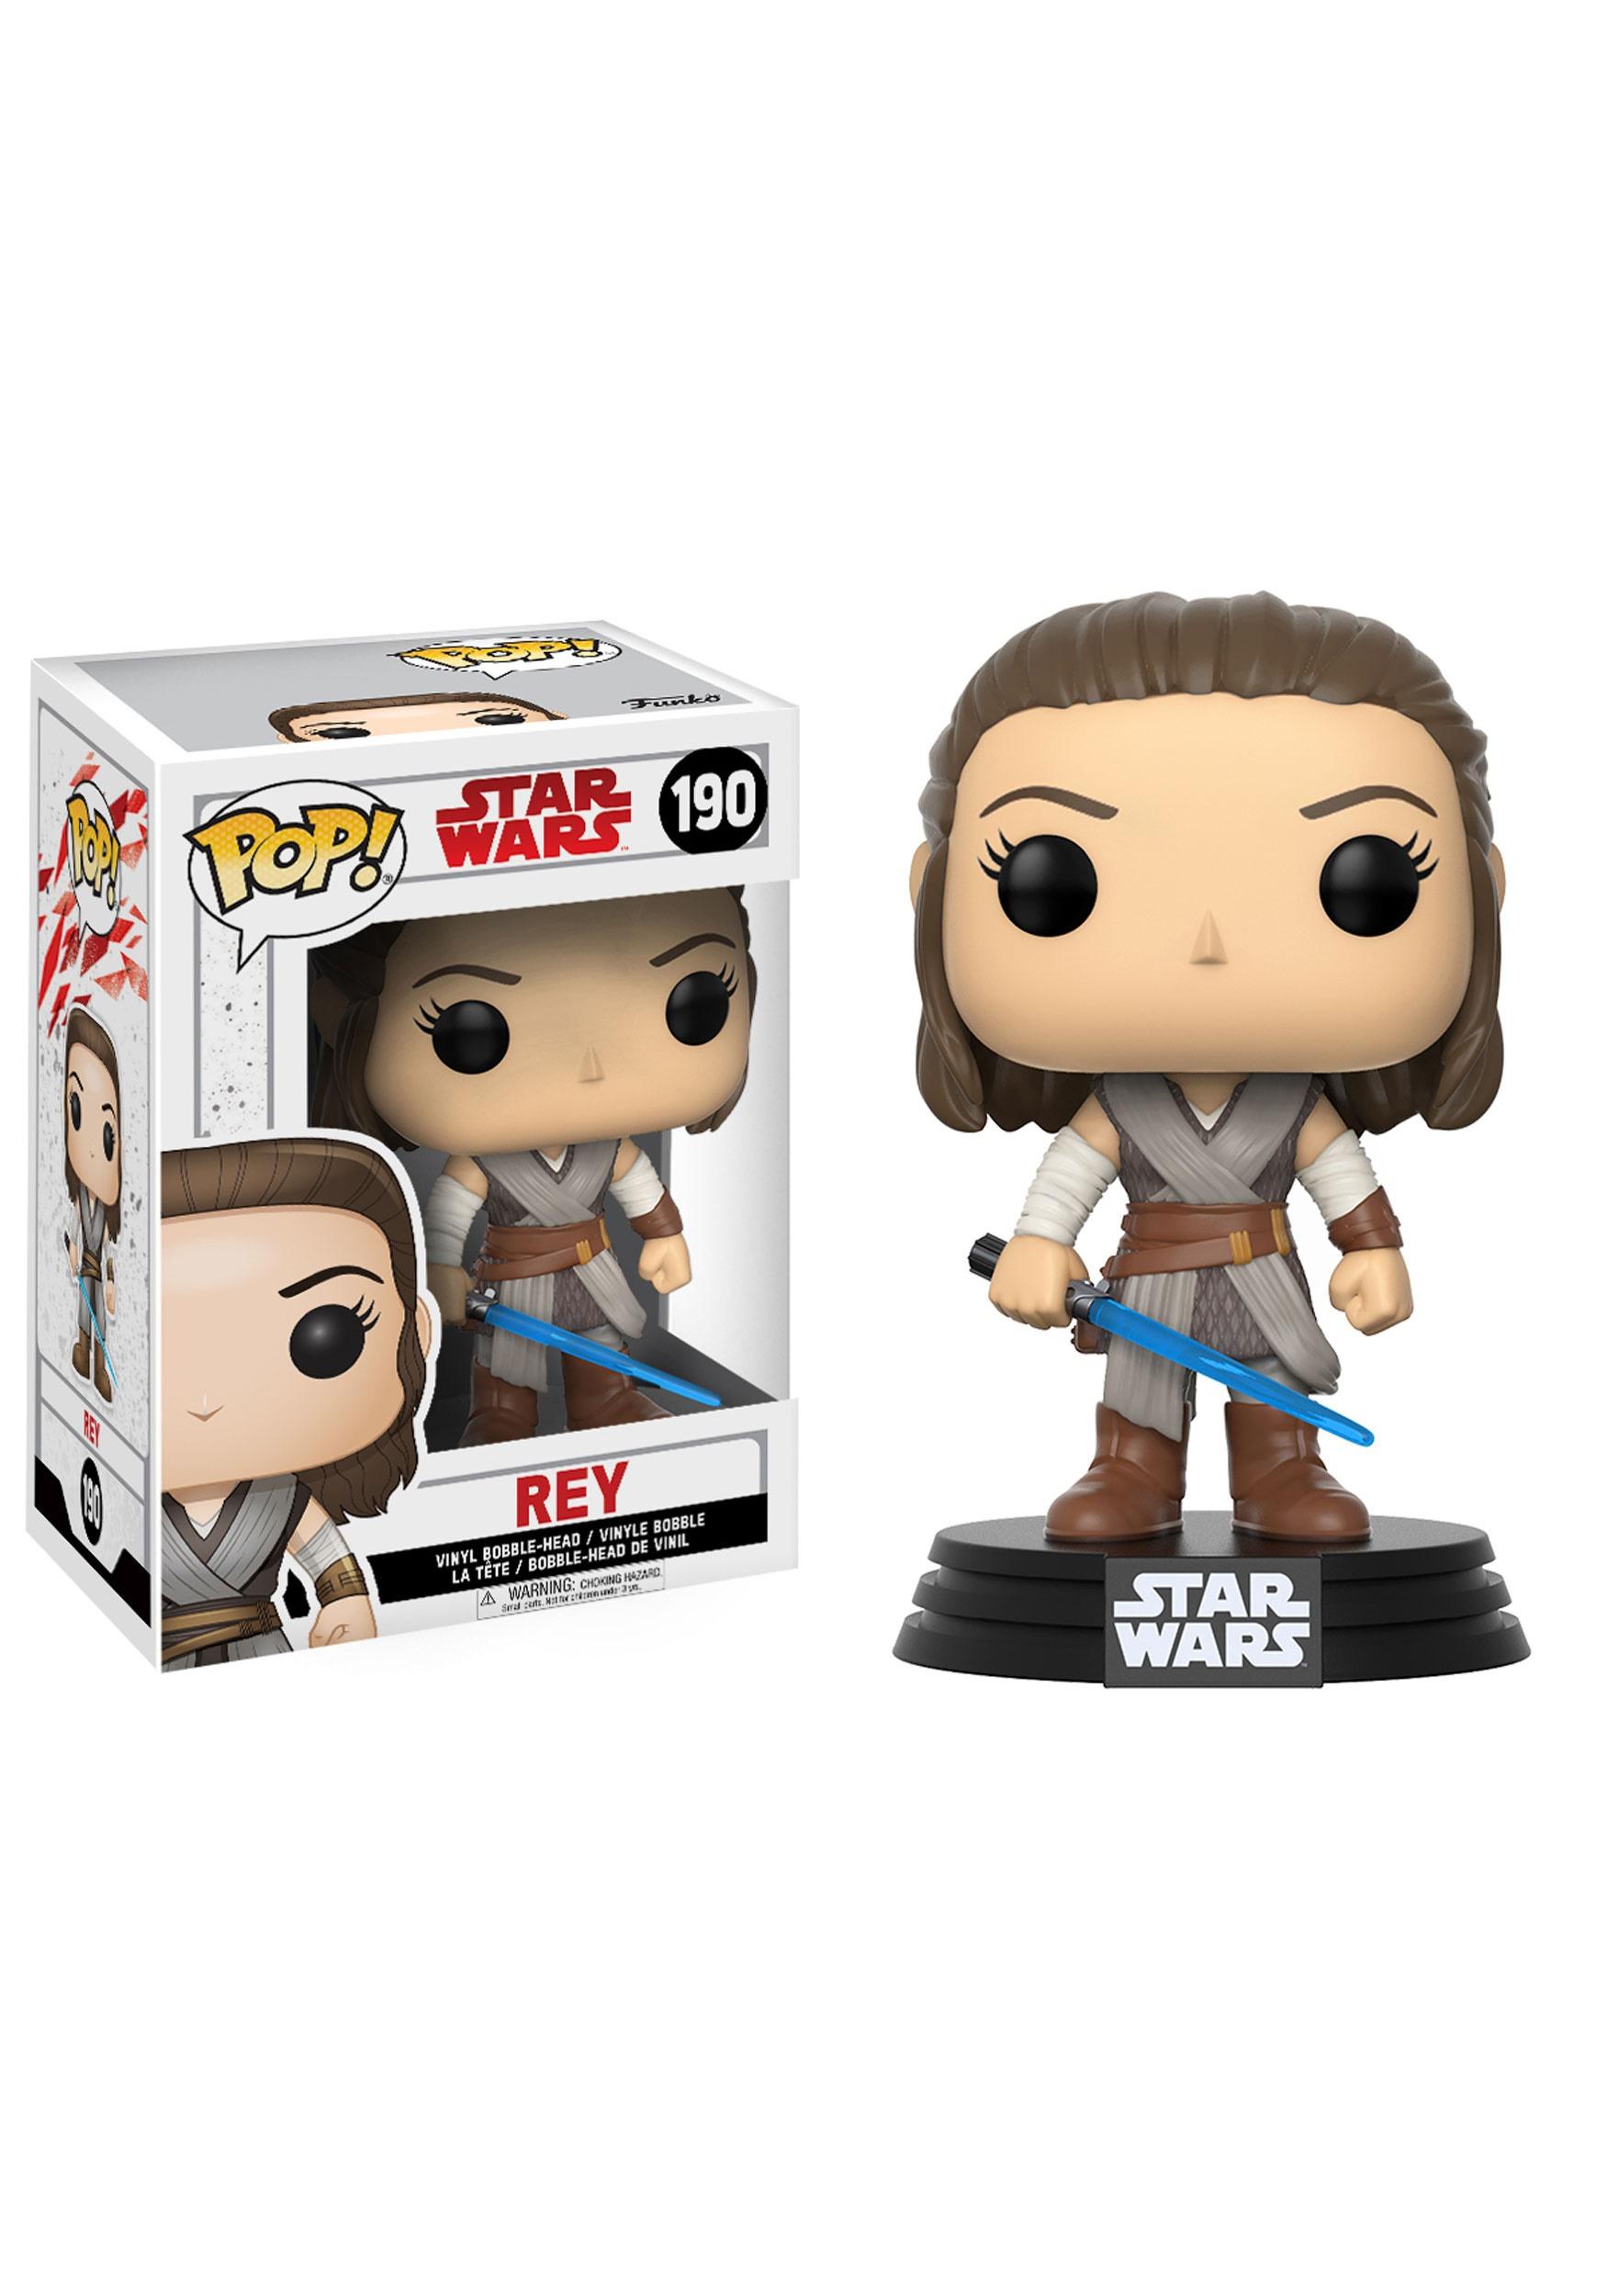 Star Wars The Last Jedi Funko POP Rey Bobblehead Figure FN14743